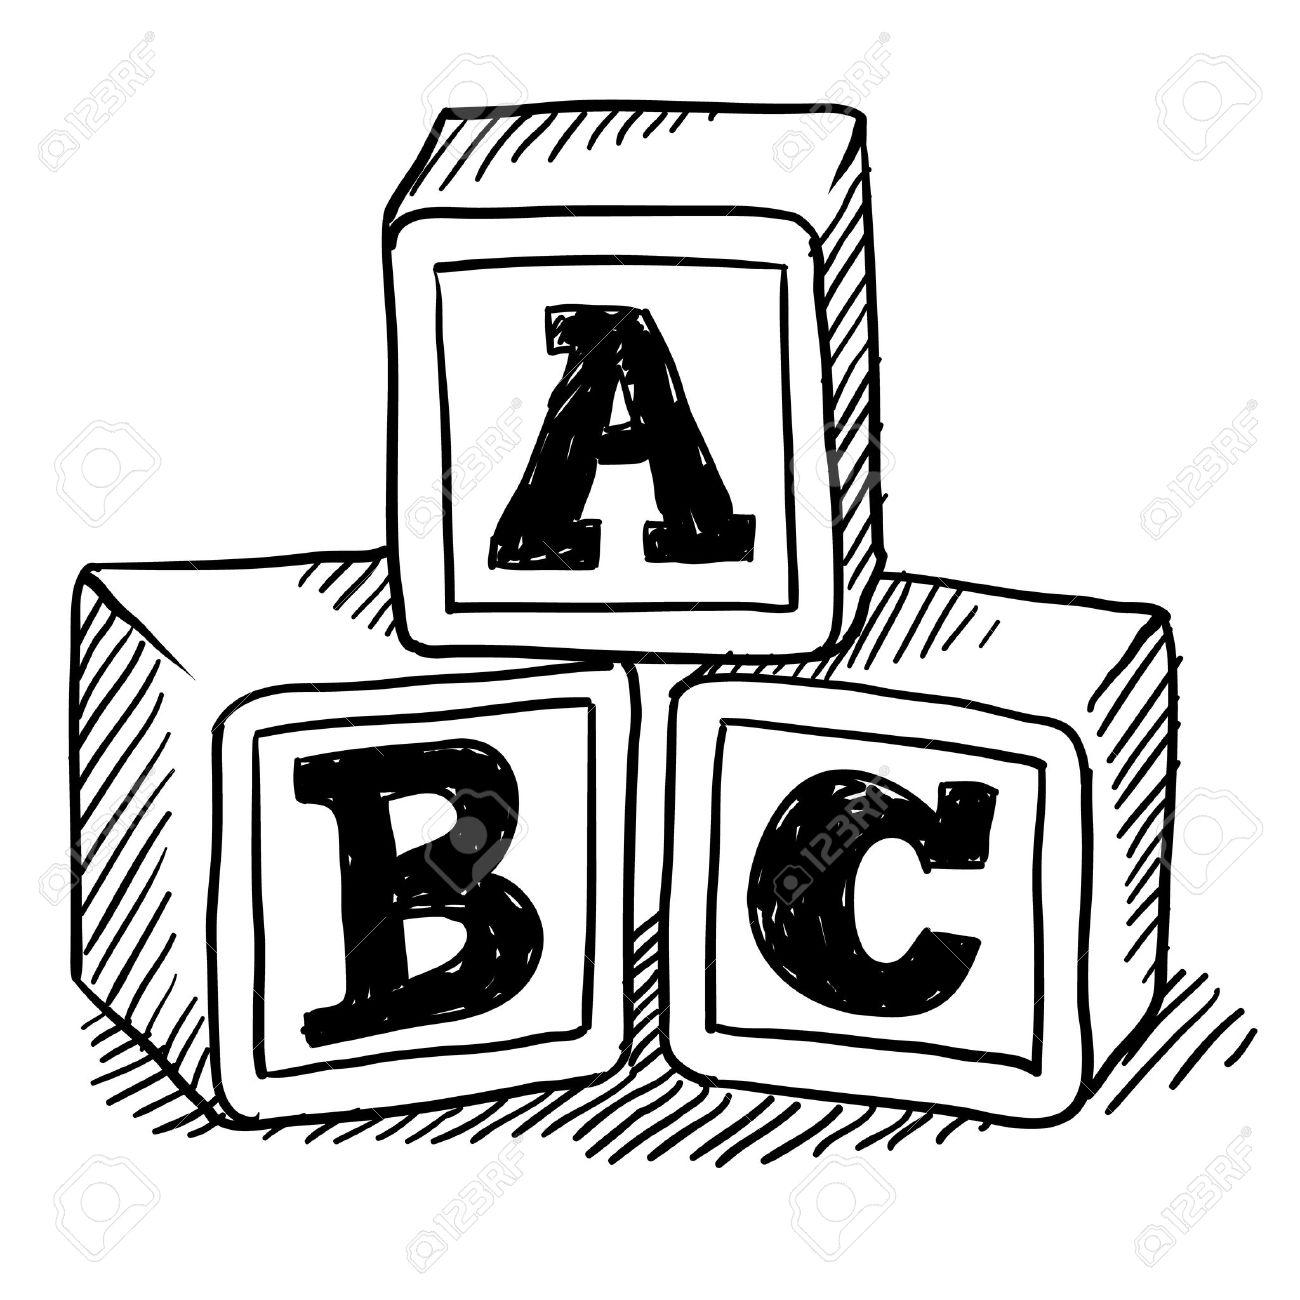 56 Abc Blocks Clipart